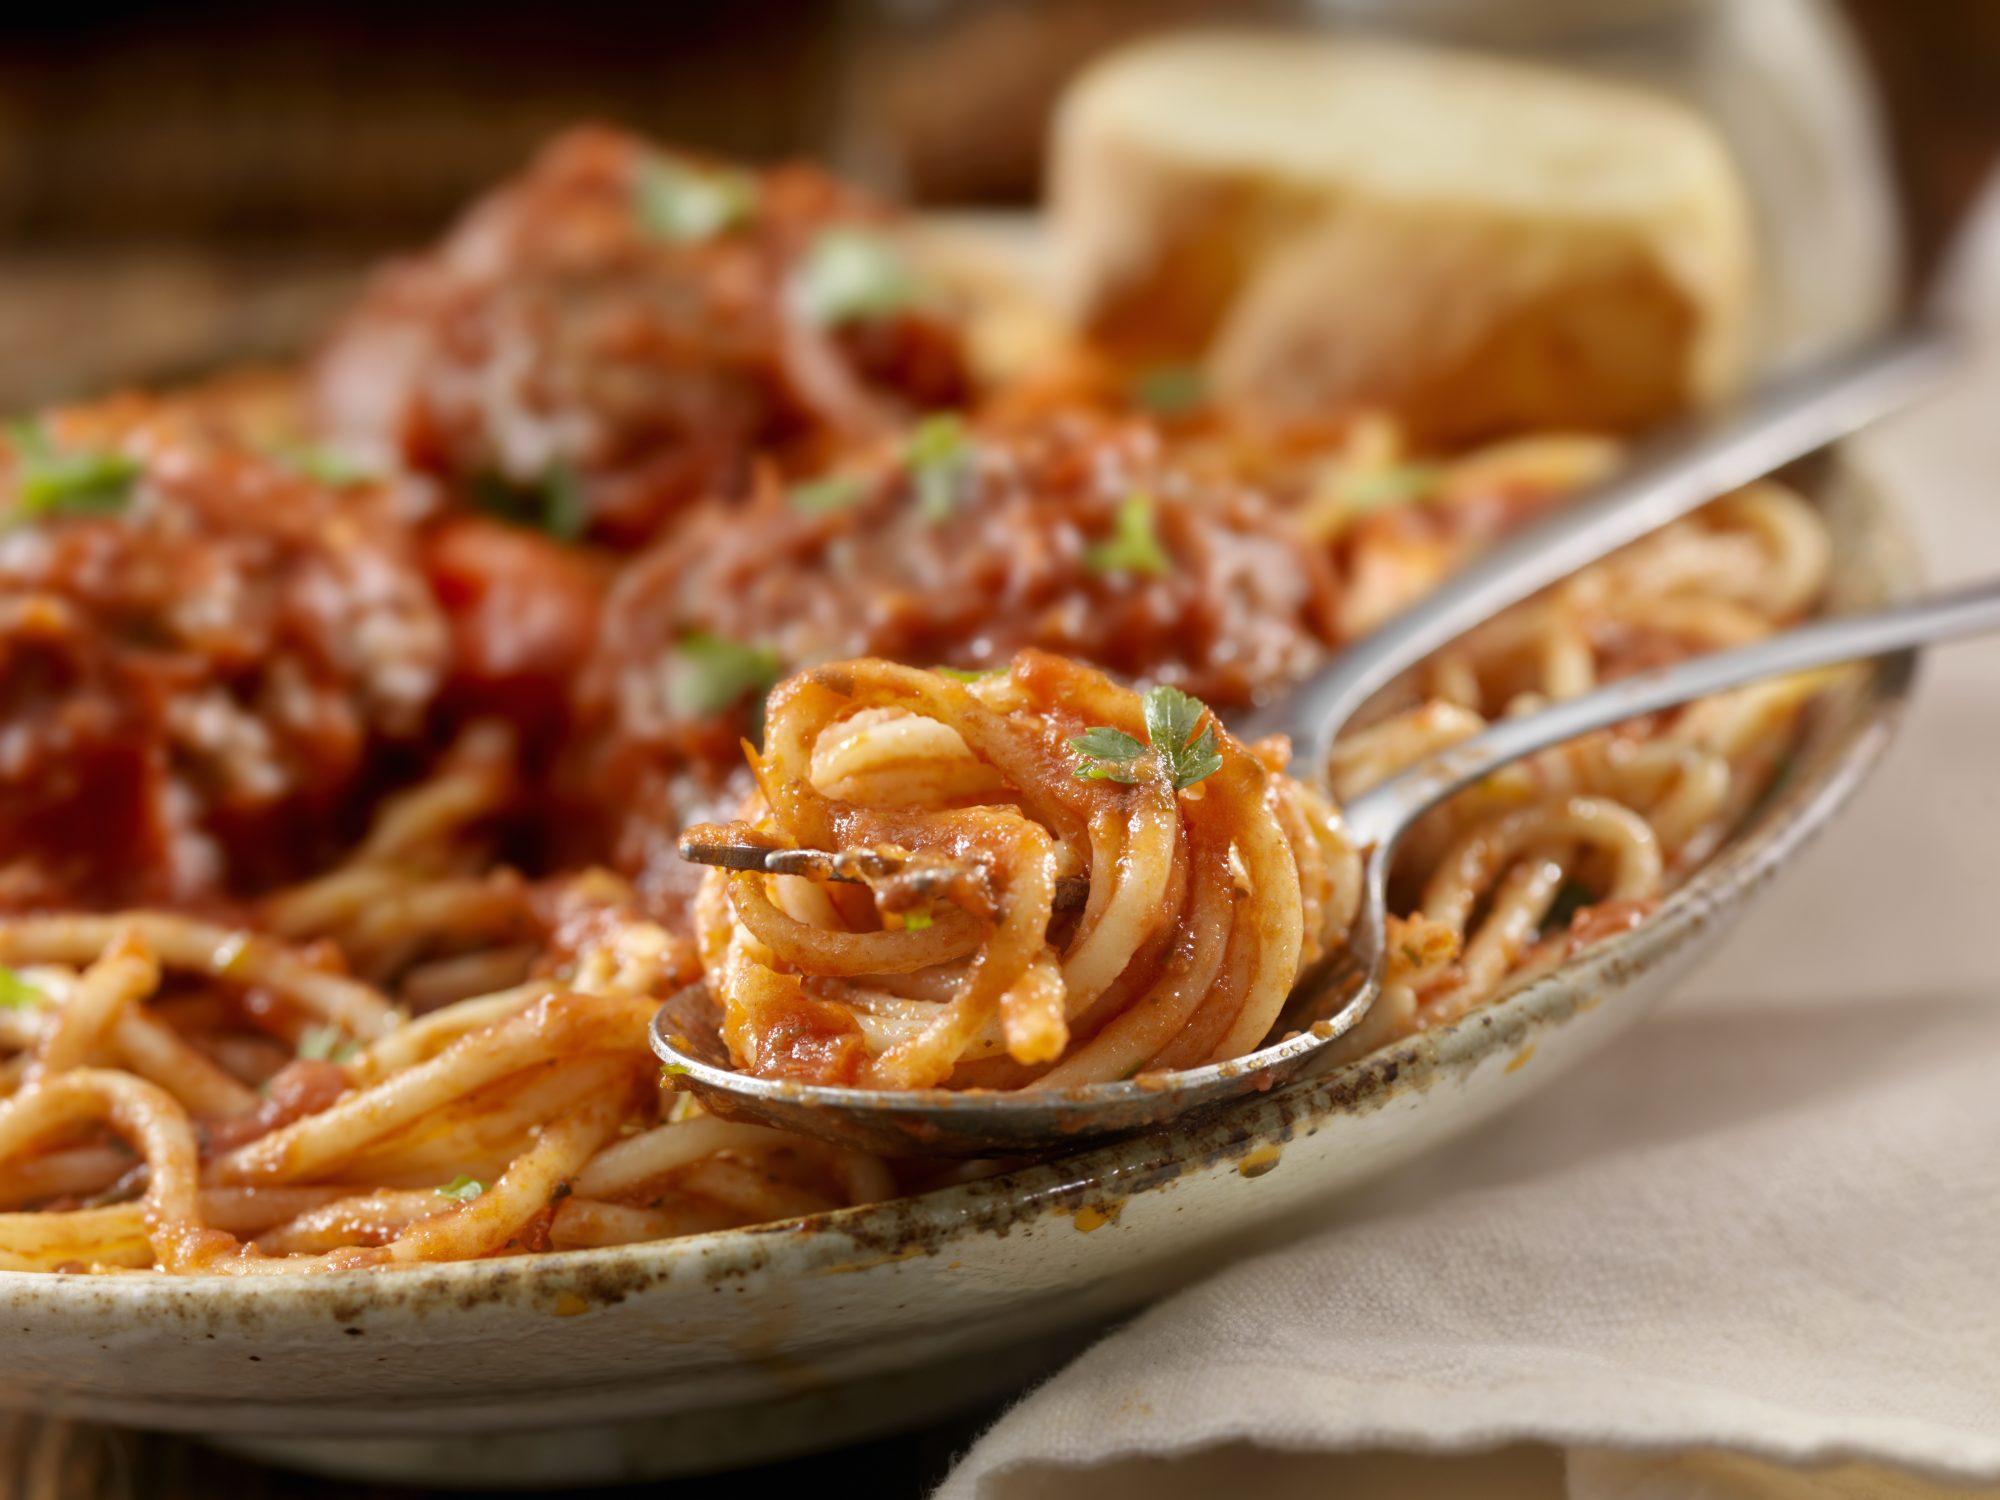 041220_Getty Spaghetti Sauce